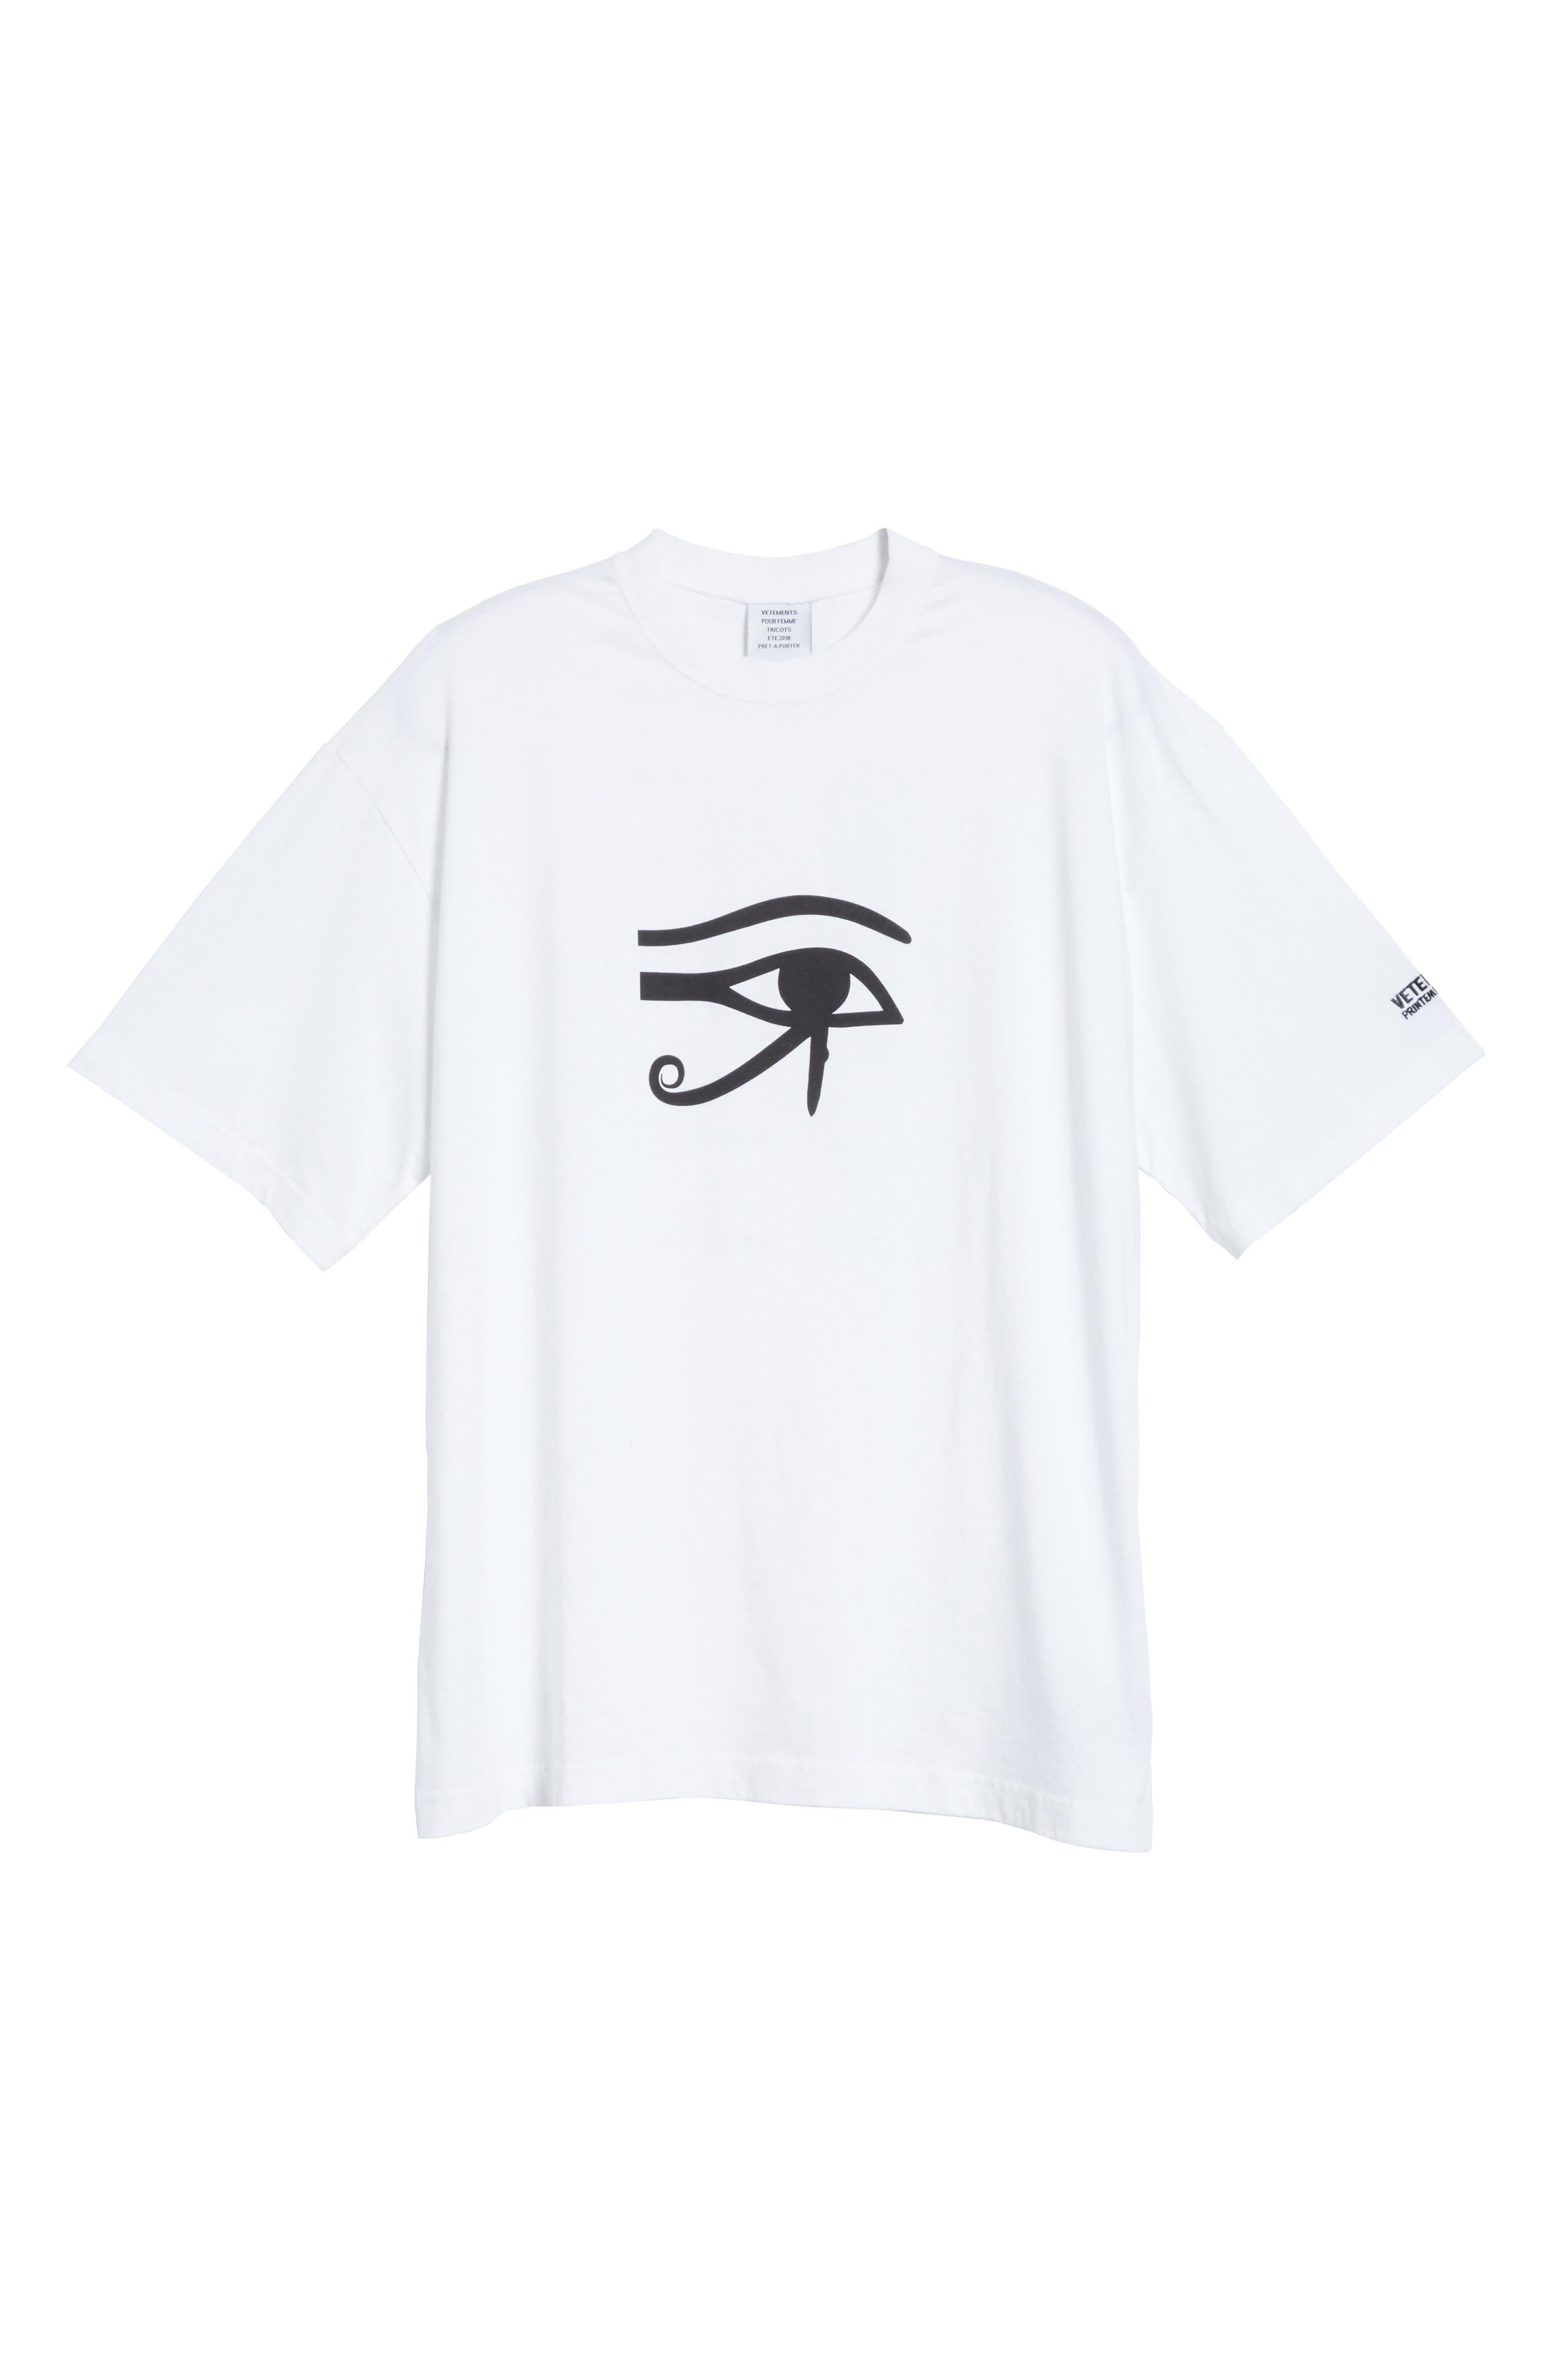 Eye of Horus Cotton Tee,                             Alternate thumbnail 6, color,